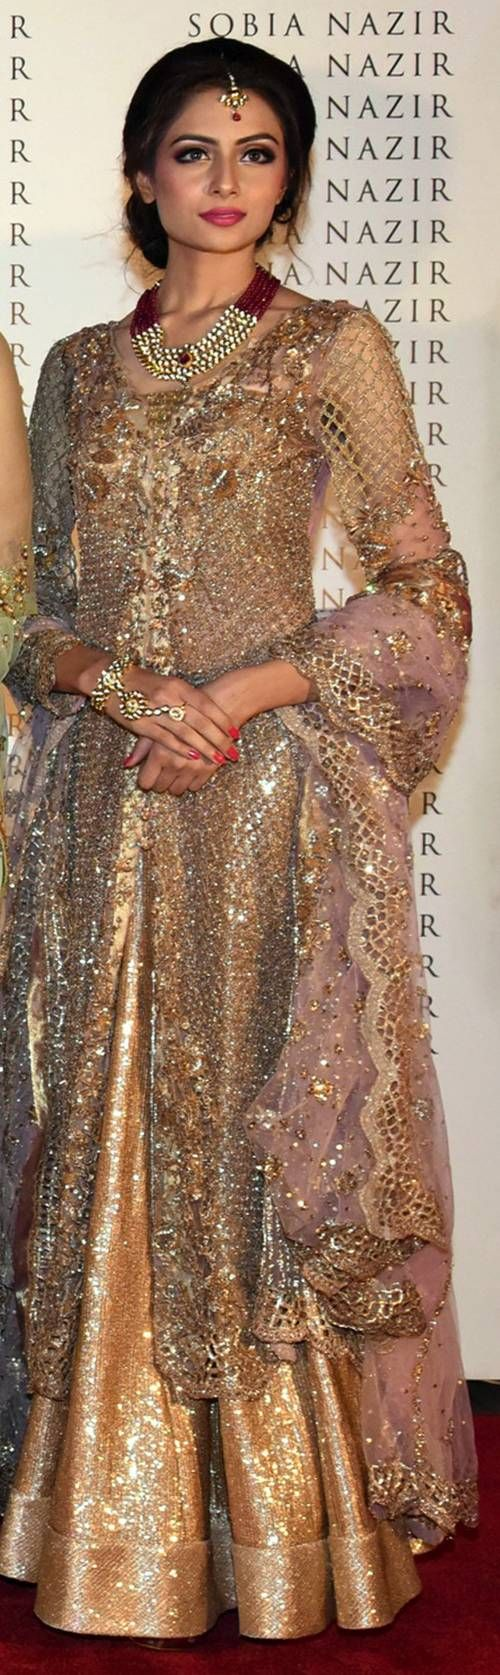 Best Bridal Walima Dresses 2018-2019 Designs & Colors